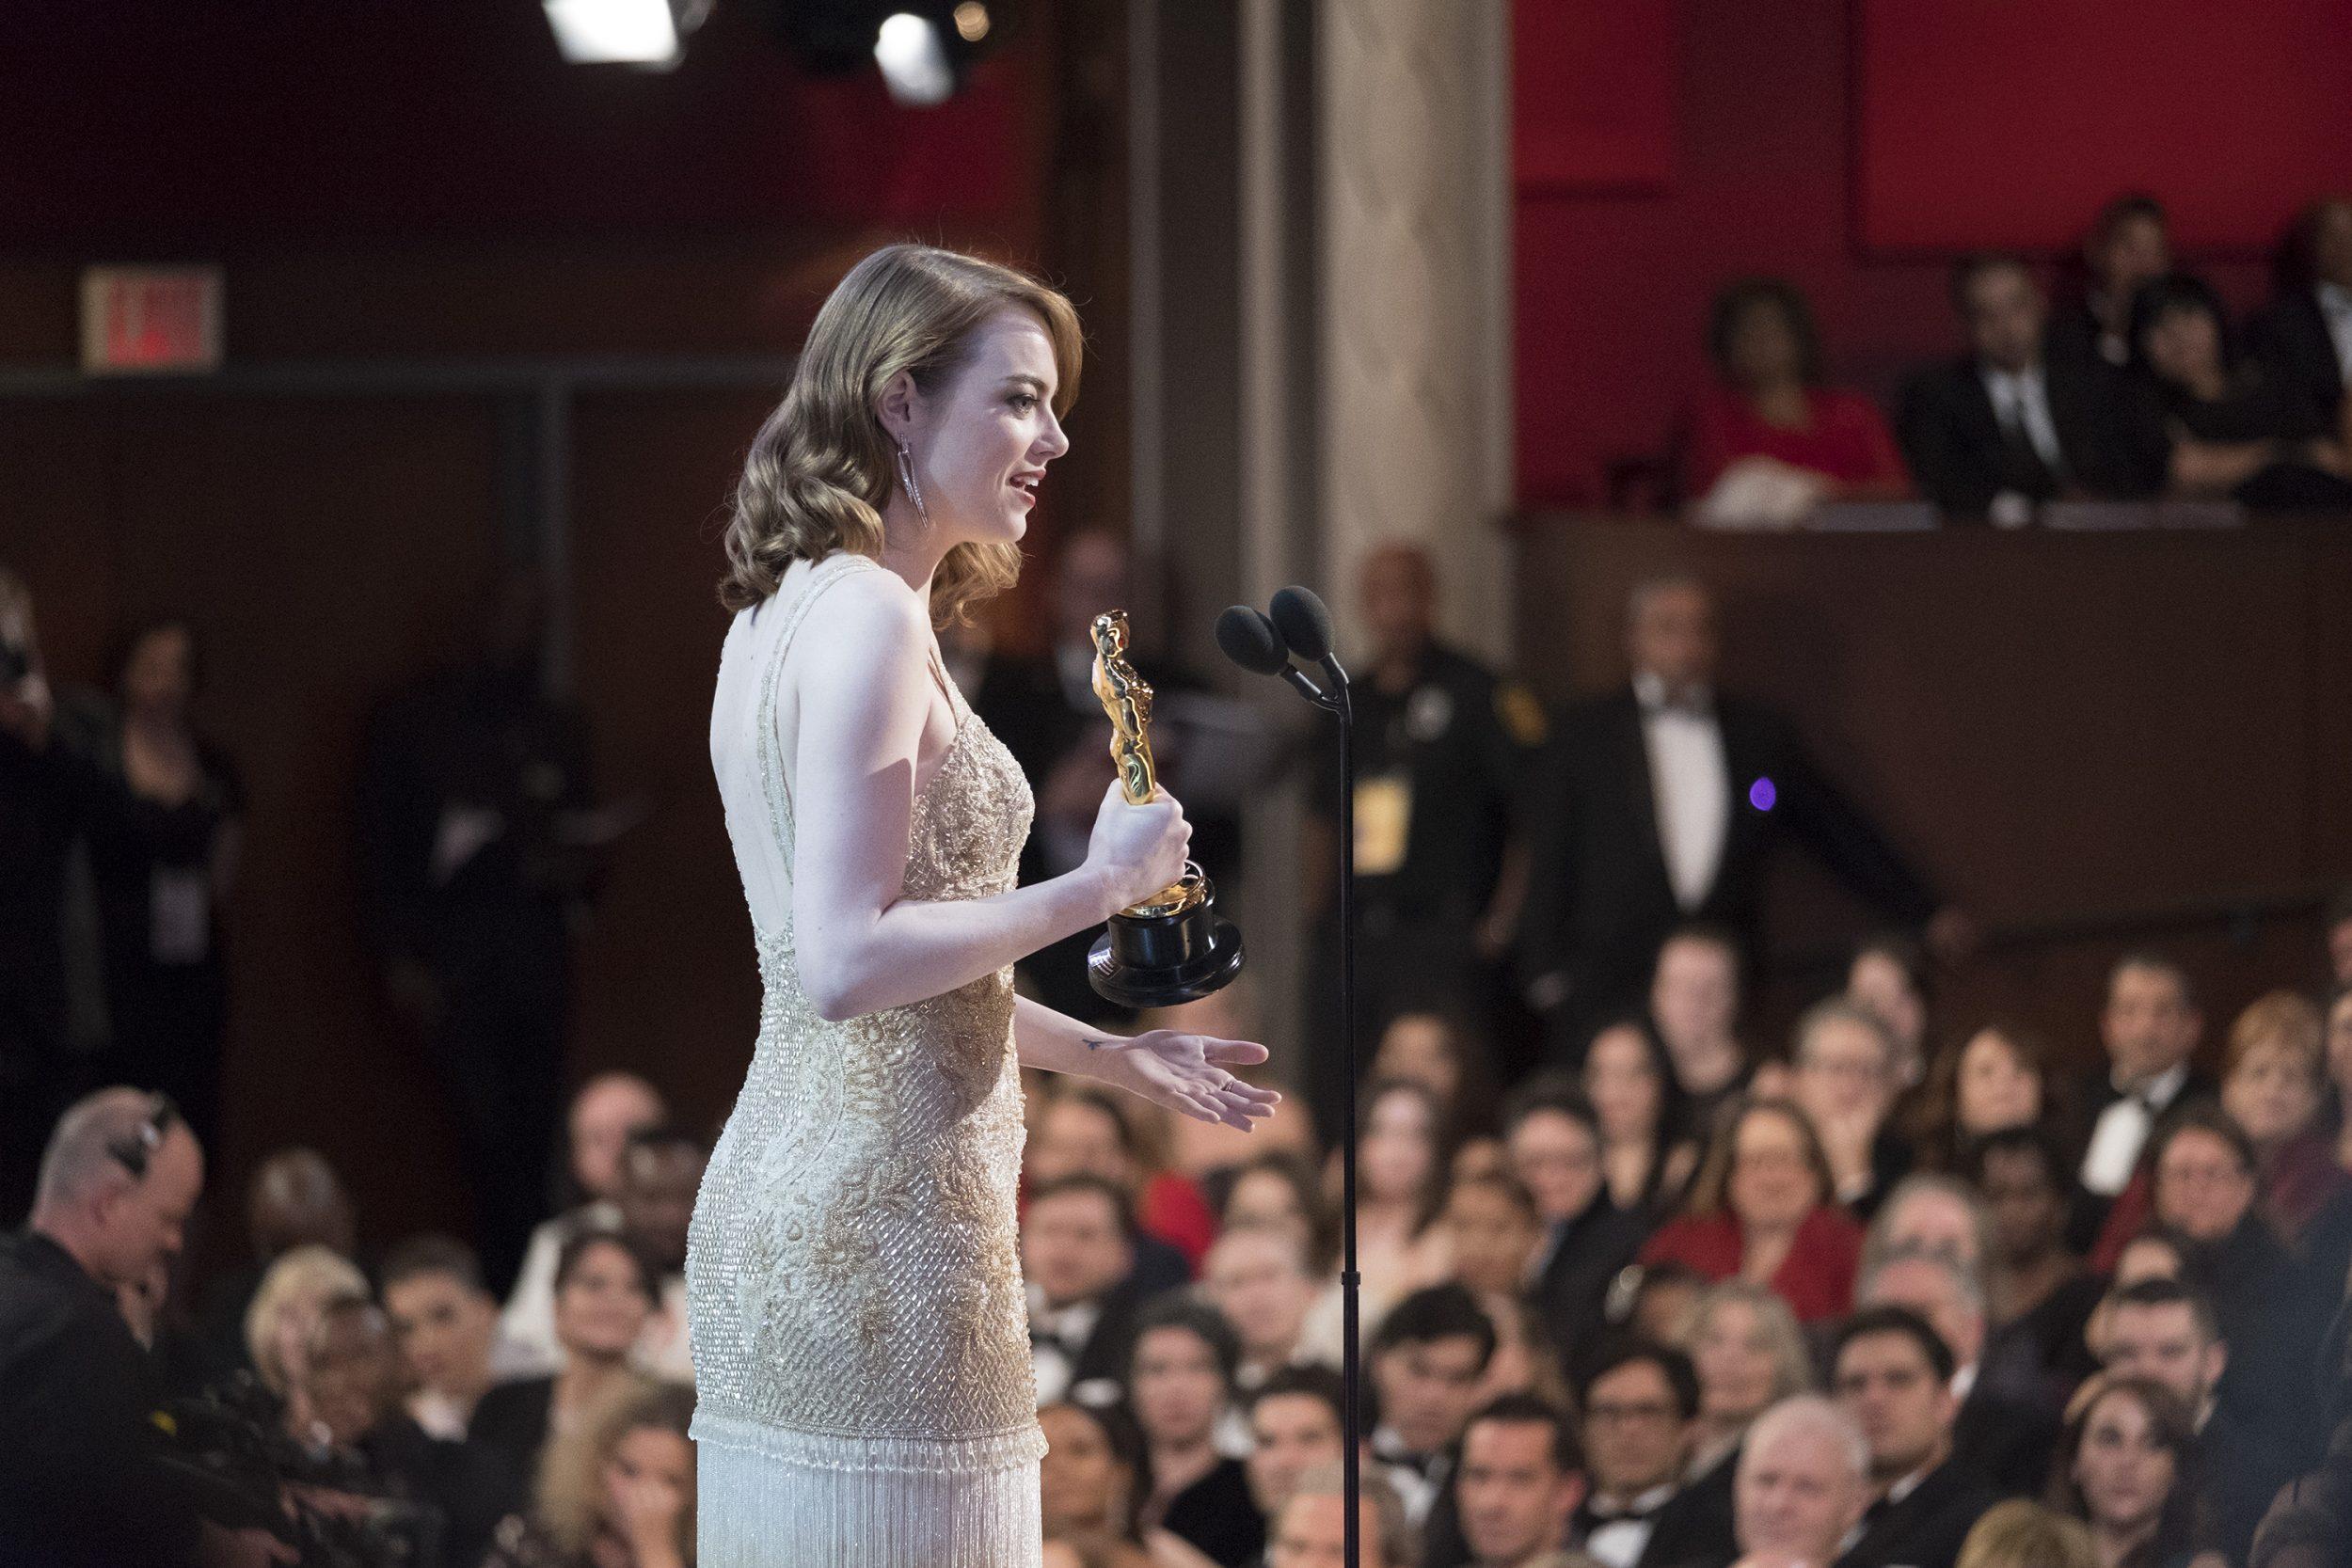 THE OSCARS(r) - The 89th Oscars(r)  broadcasts live on Oscar(r) SUNDAY, FEBRUARY 26, 2017, on the ABC Television Network. (ABC/Adam Rose) EMMA STONE